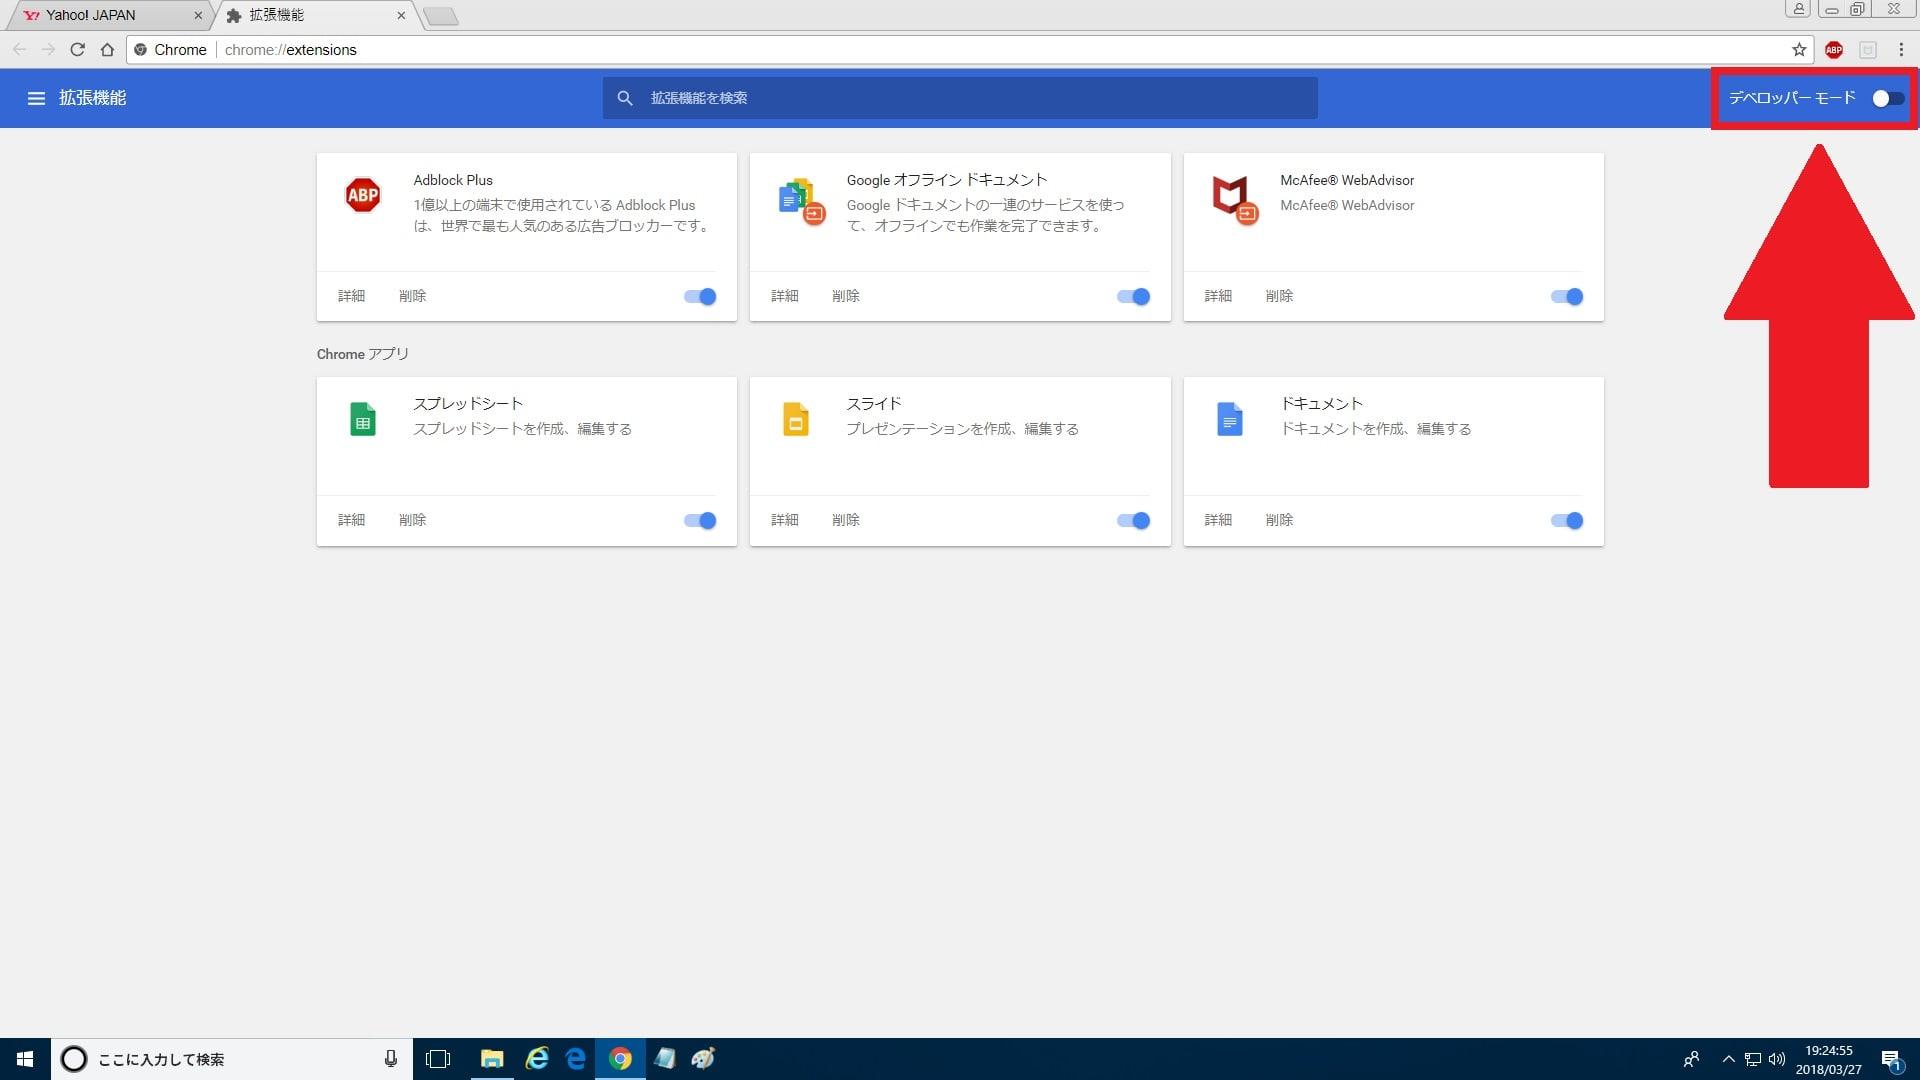 Google Chromeの拡張機能の一覧画面